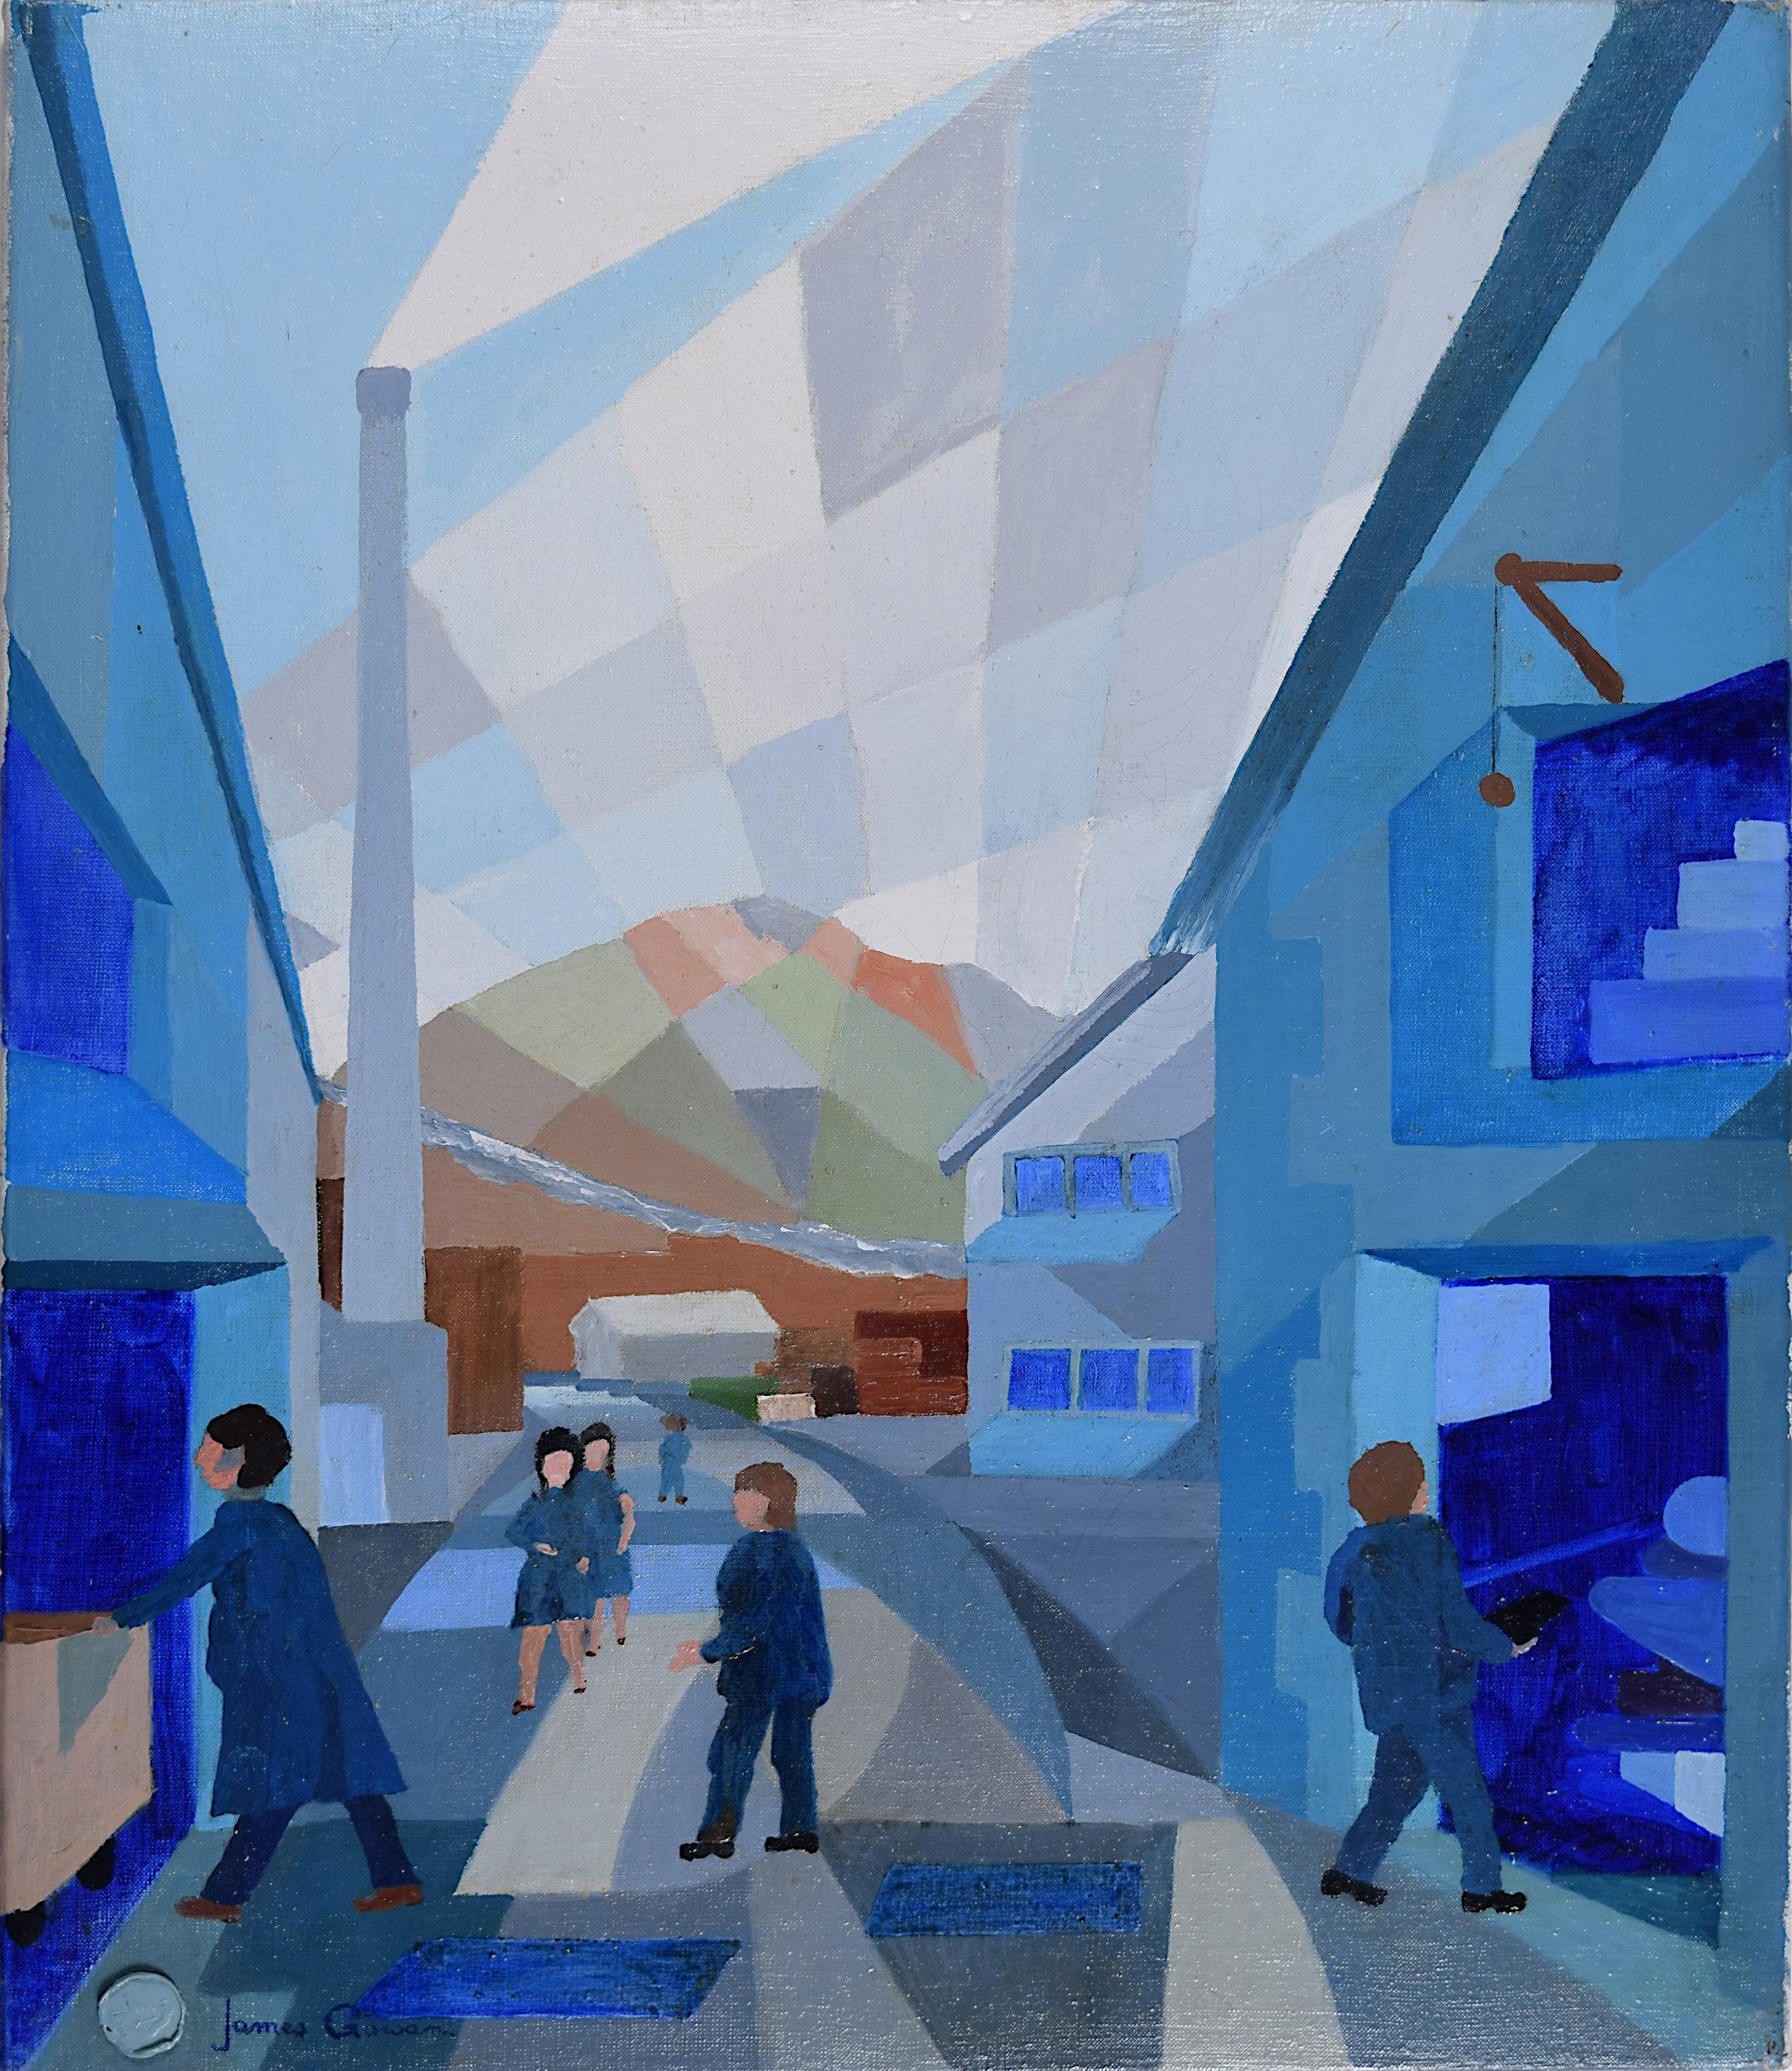 James Gowan FRIBA Blue Mill at Backbarrow Modernist Architect Leicester